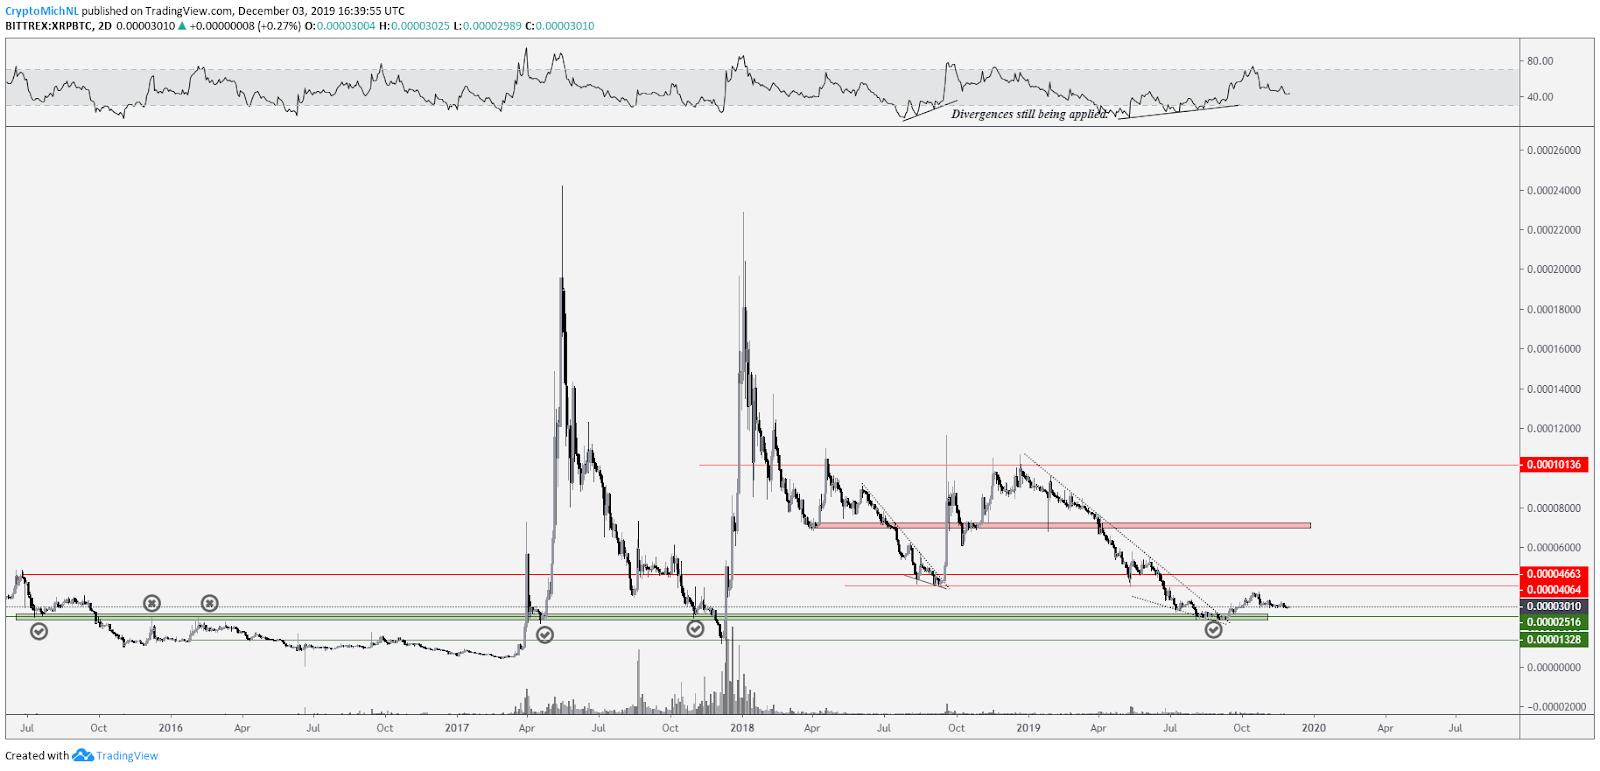 XRP BTC 2-day chart